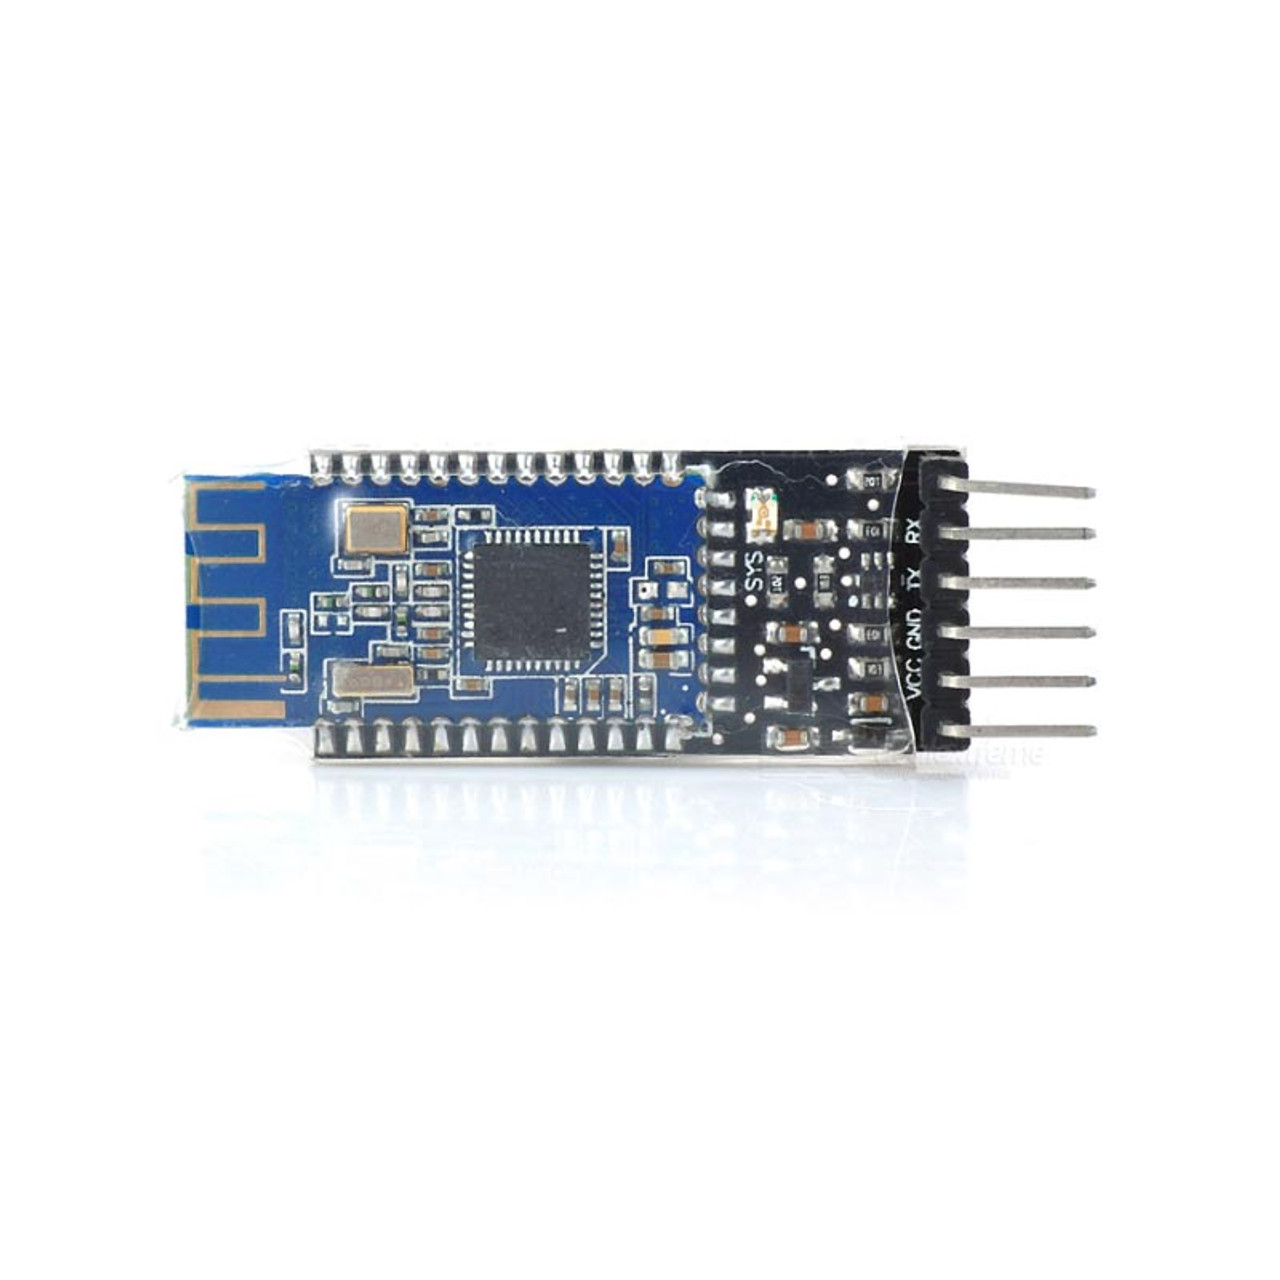 HM-10S-BB - 4 0 BLE Bluetooth Module Breakout Board